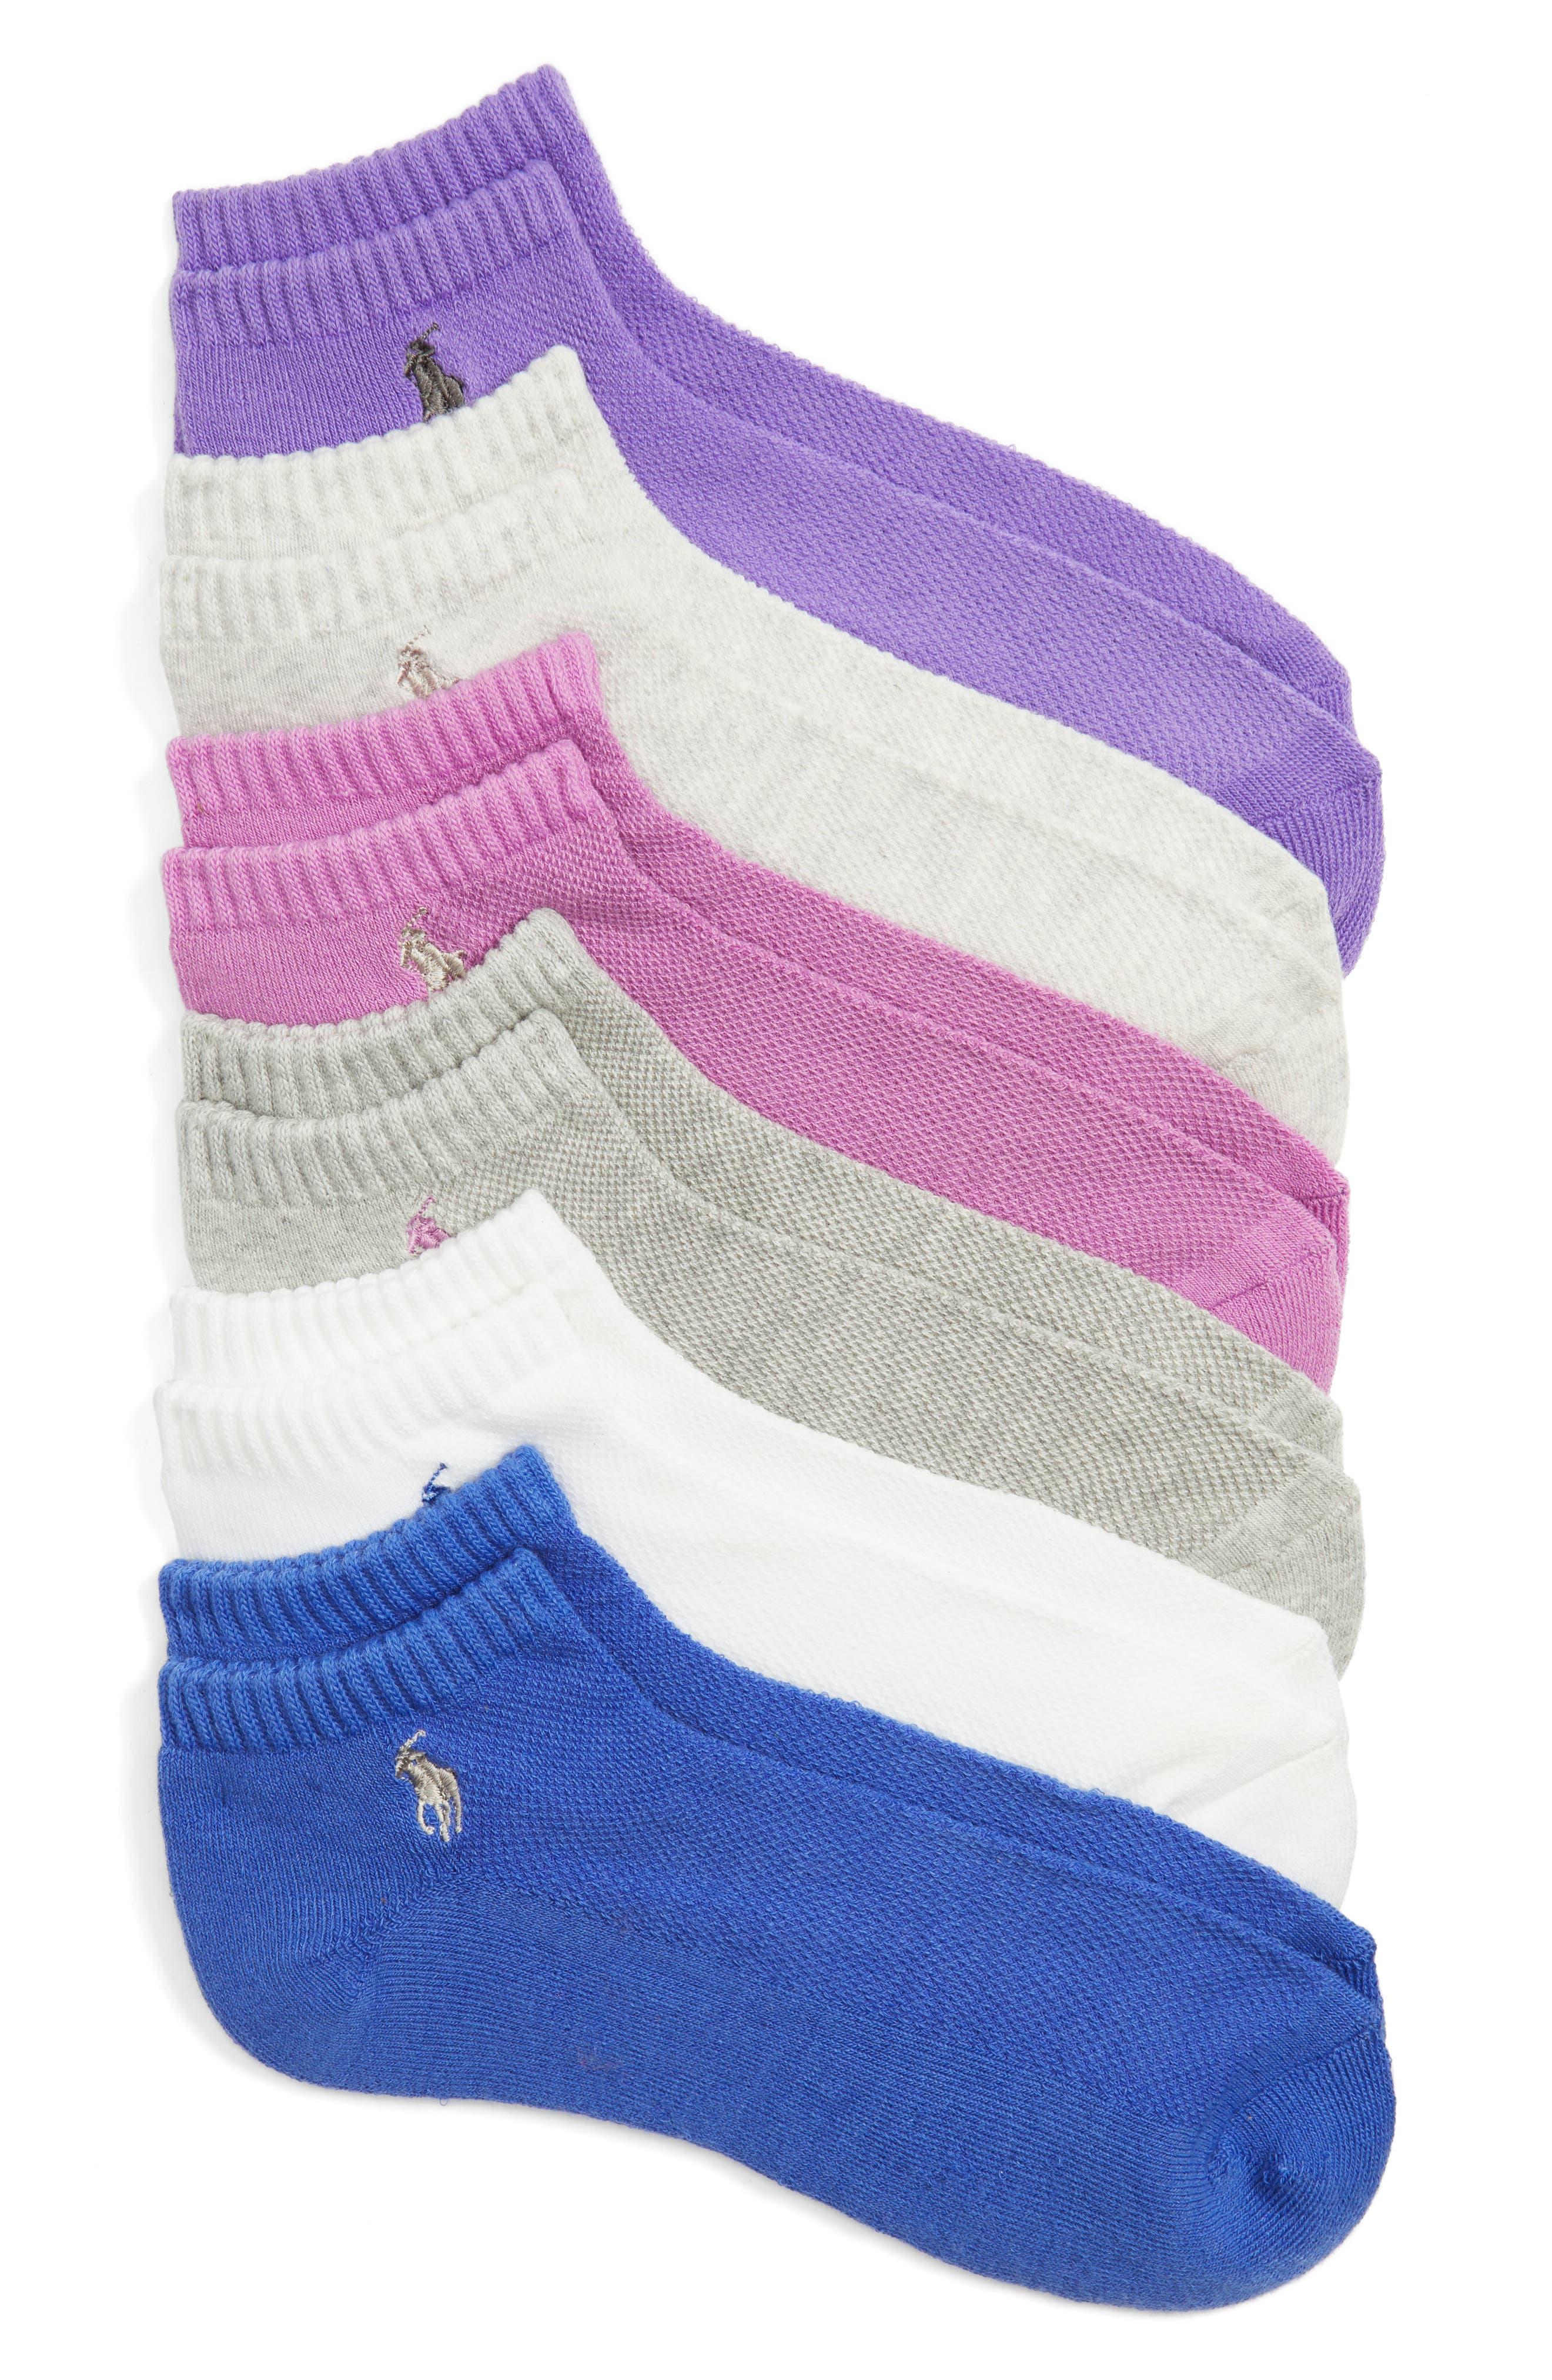 RALPH LAUREN Sport 6-Pack Low-Cut Socks